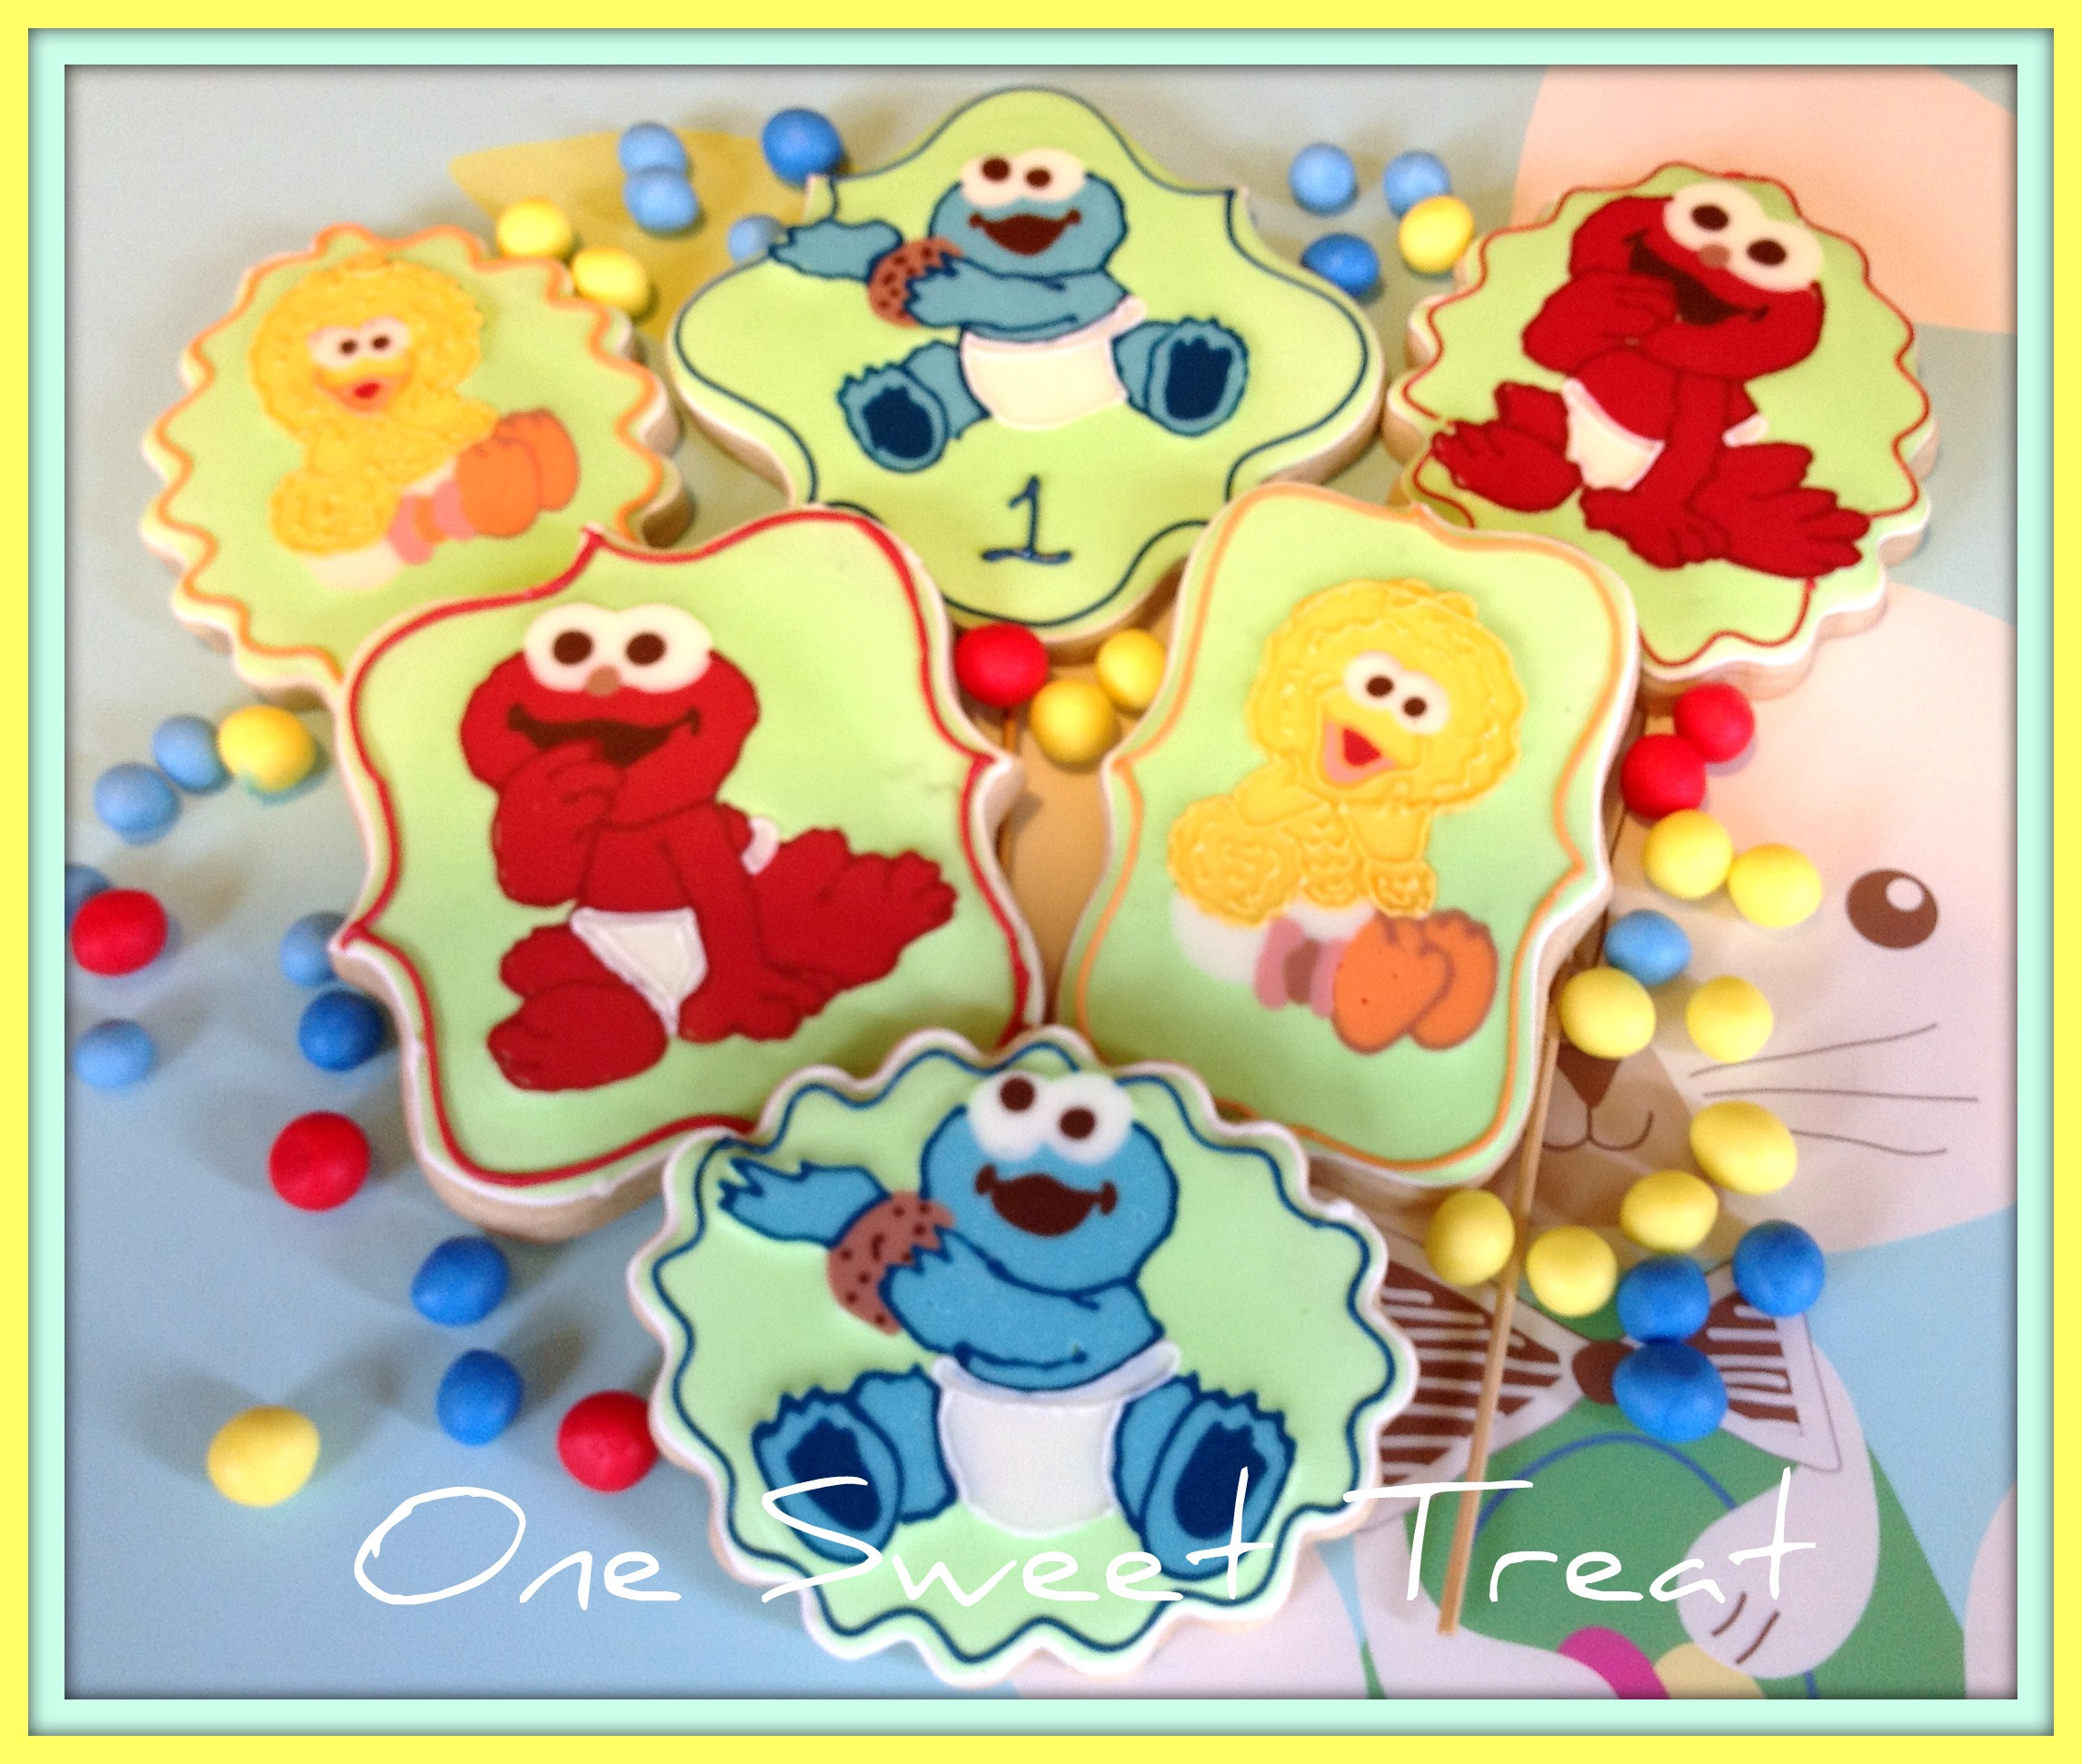 e Sweet Treat Baby Sesame Street Cake